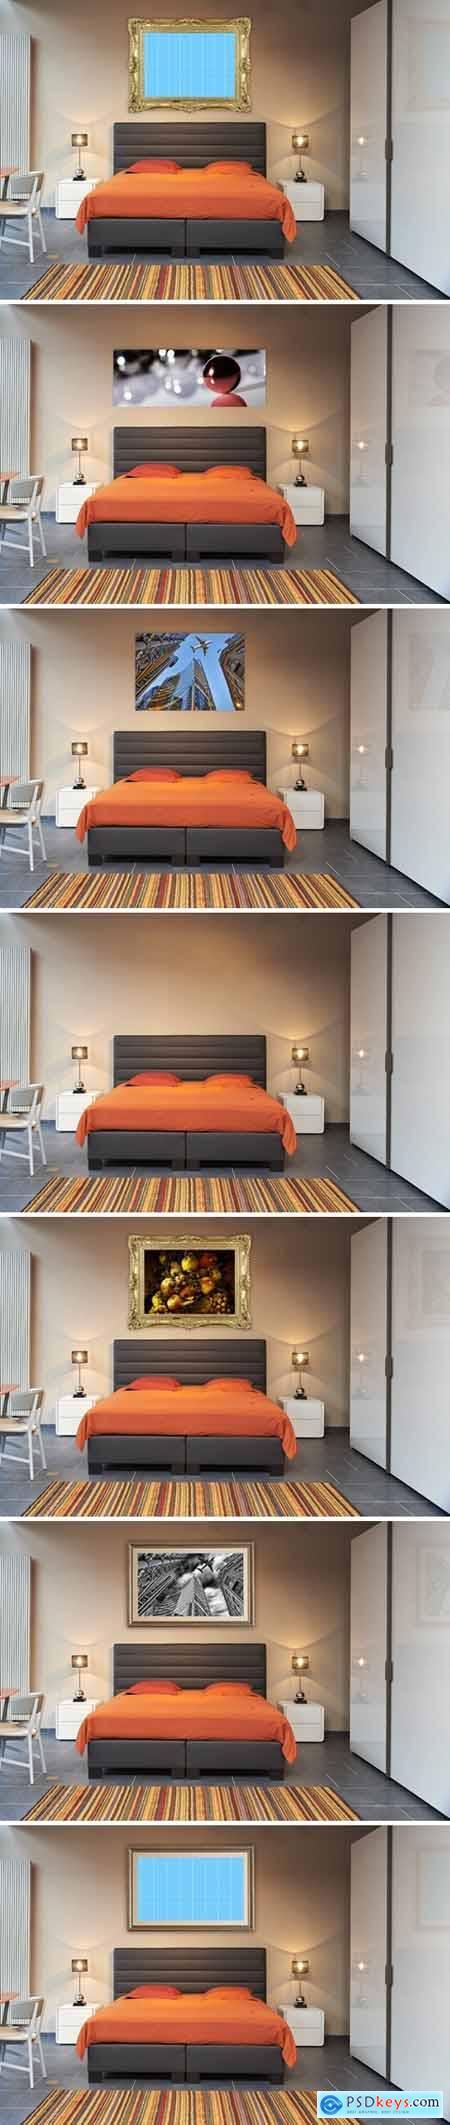 Bedroom_Mockup-01